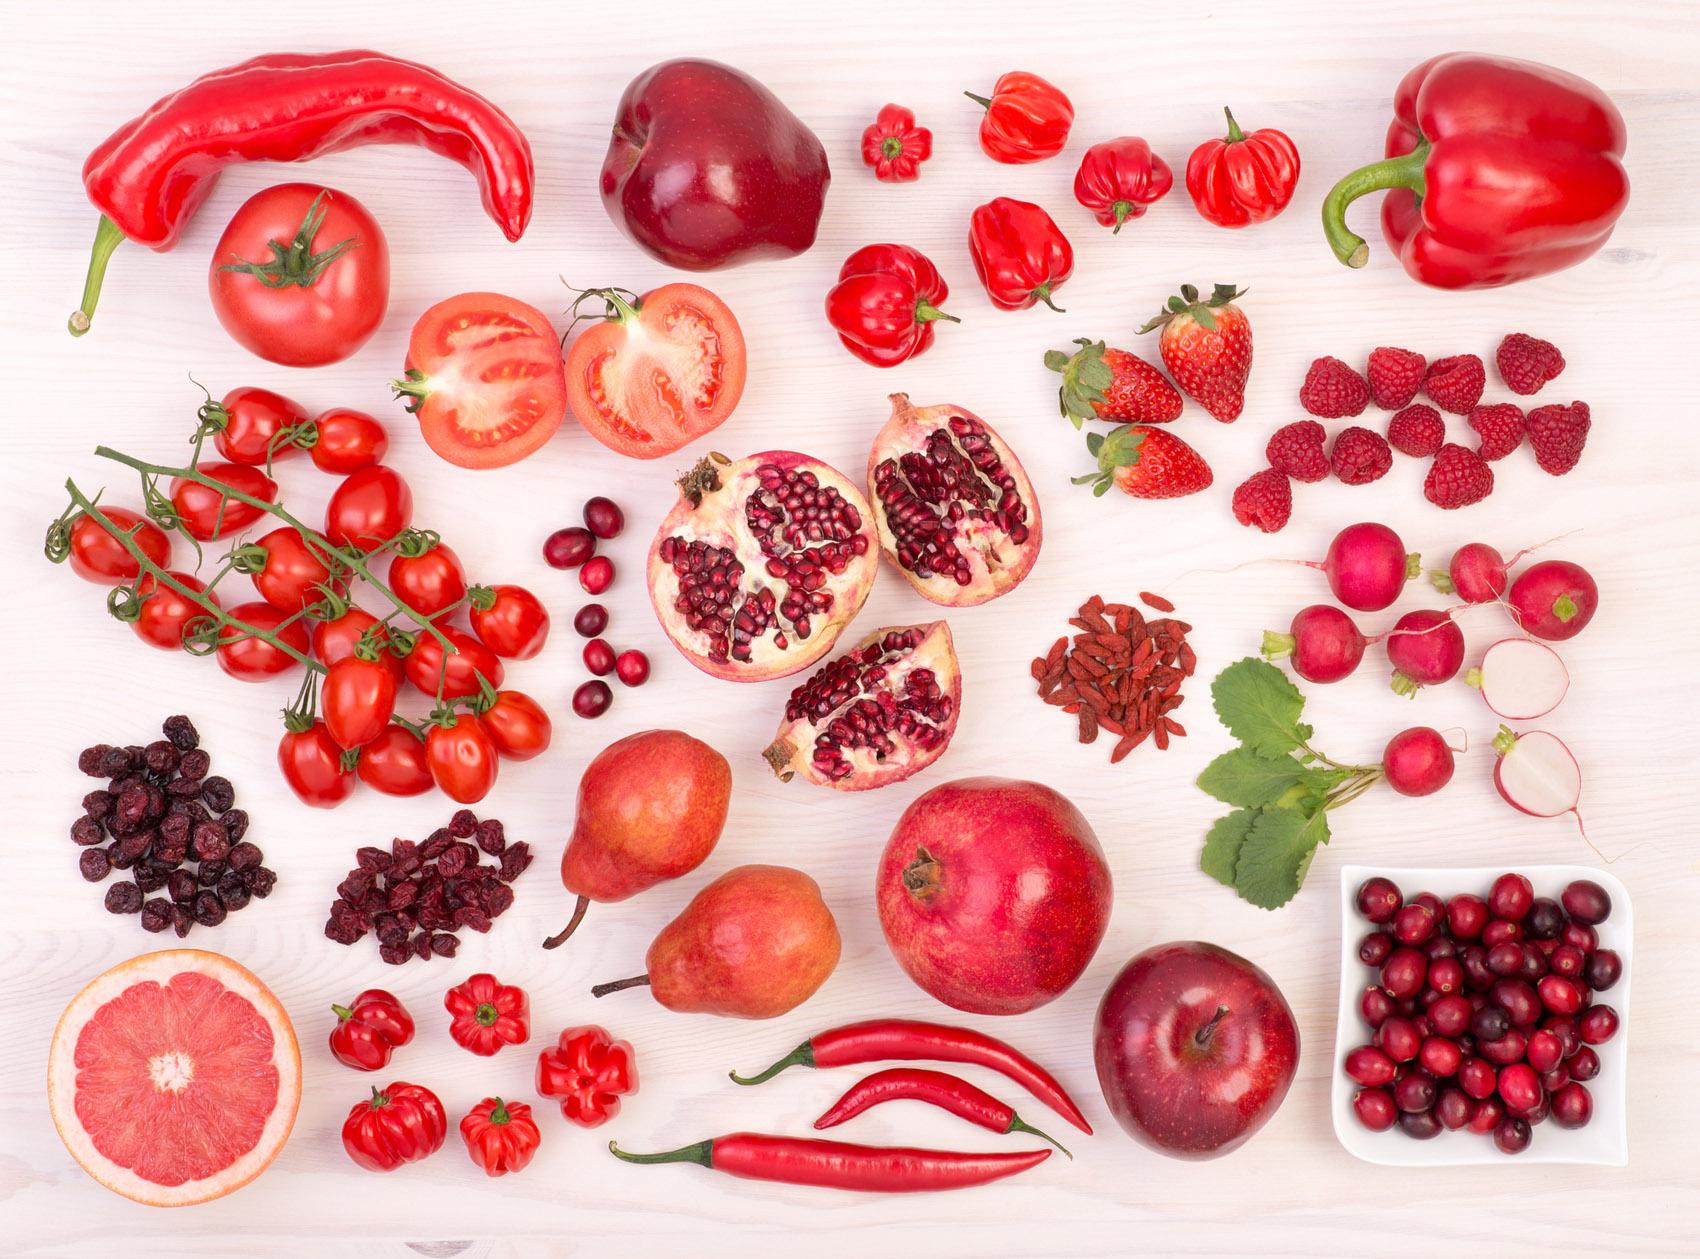 frutta e verdure rosse, melagrana, ciliegie